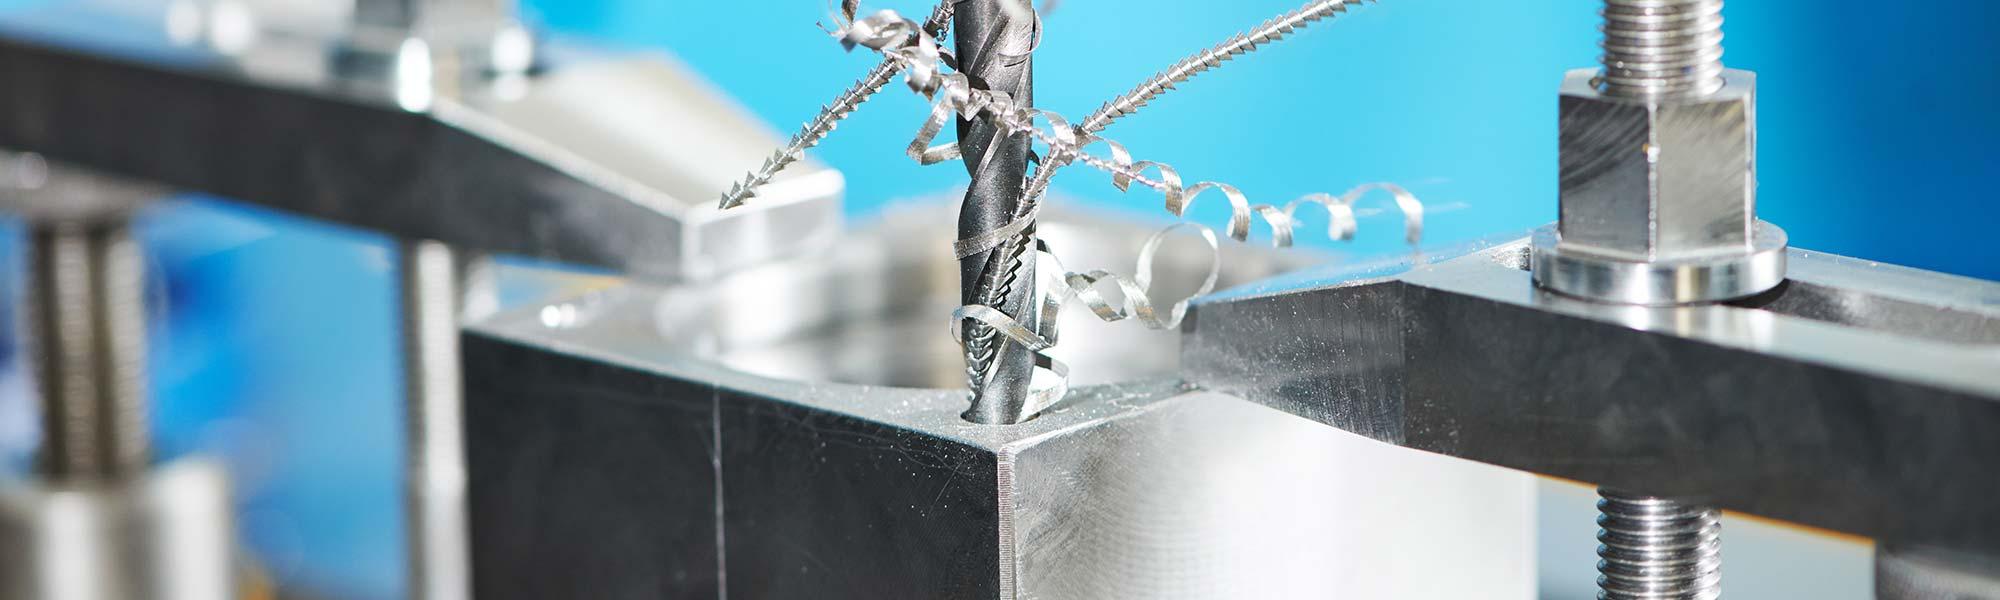 ATF-Thielmann CNC-Frästechnologie